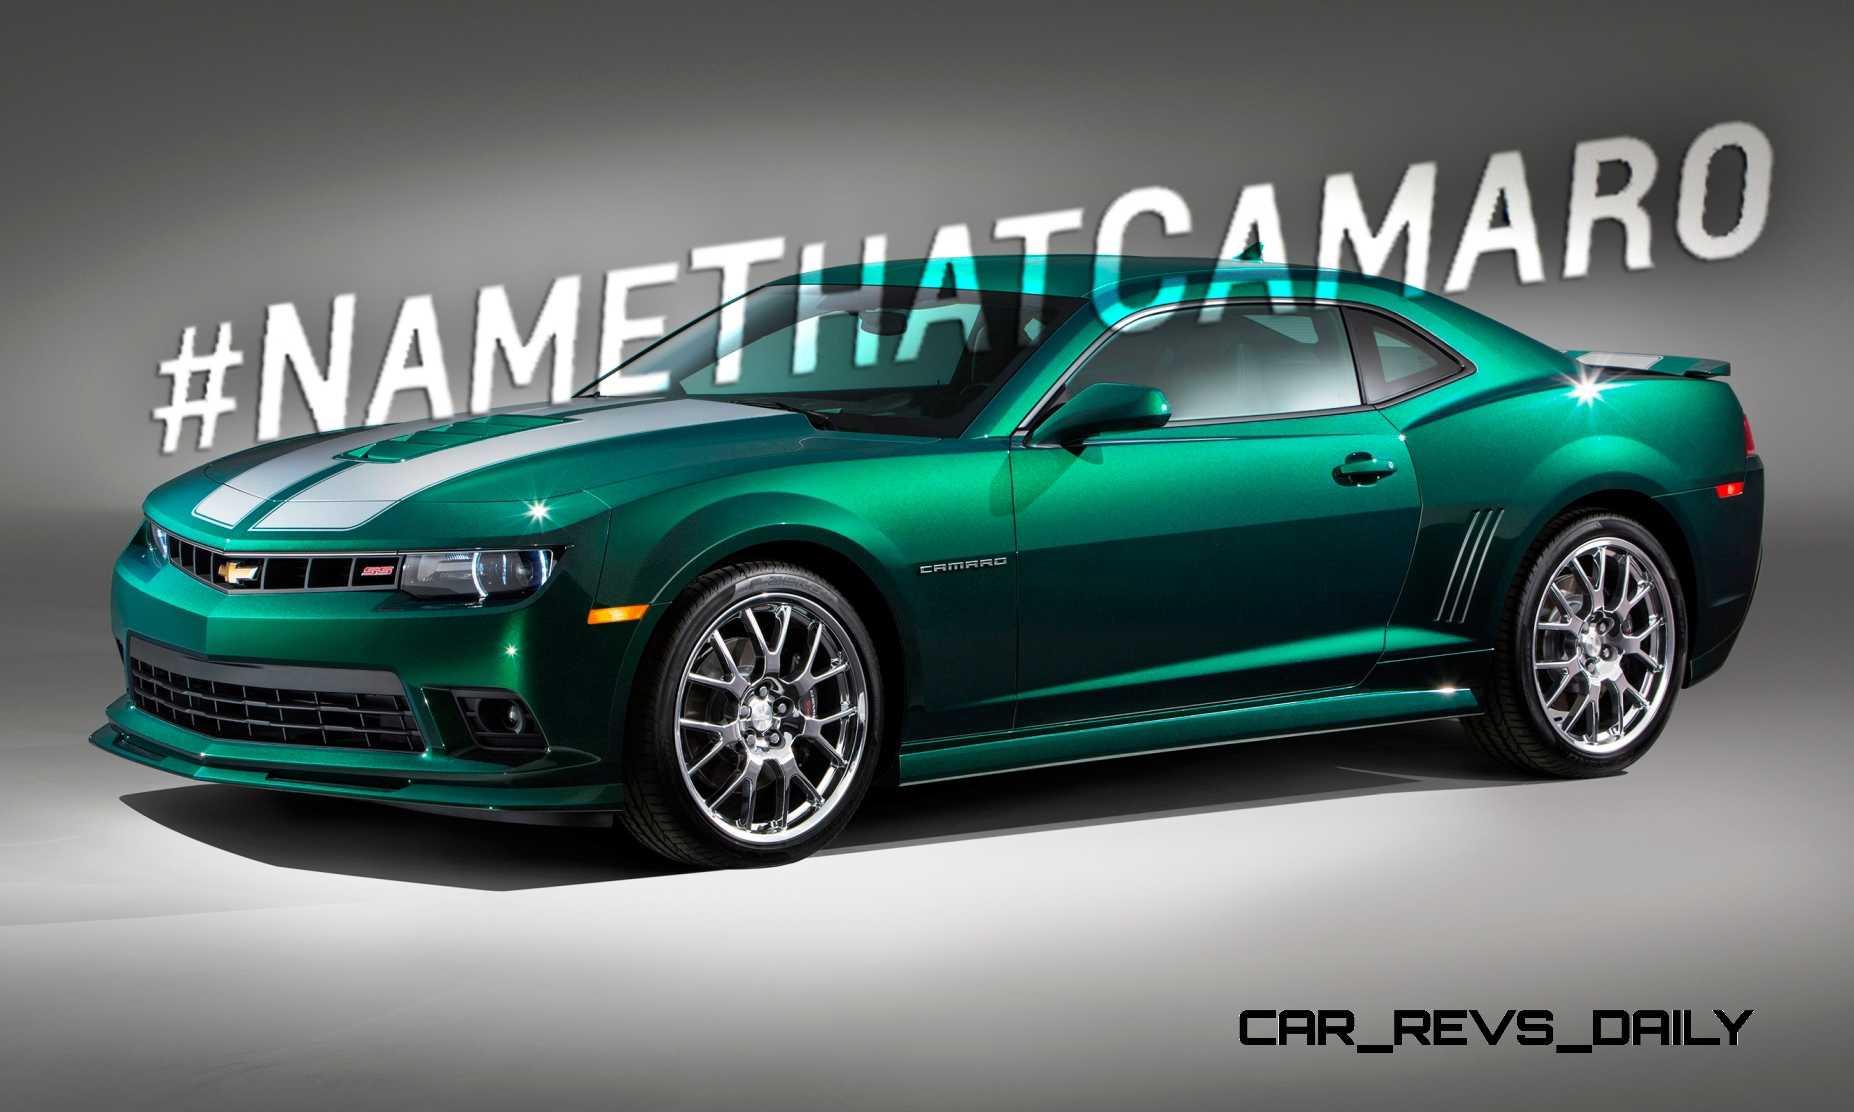 2014 Chevy Ss For Sale >> #NameThatCamaro! 2015 Chevrolet Camaro SS Emerald Green ...